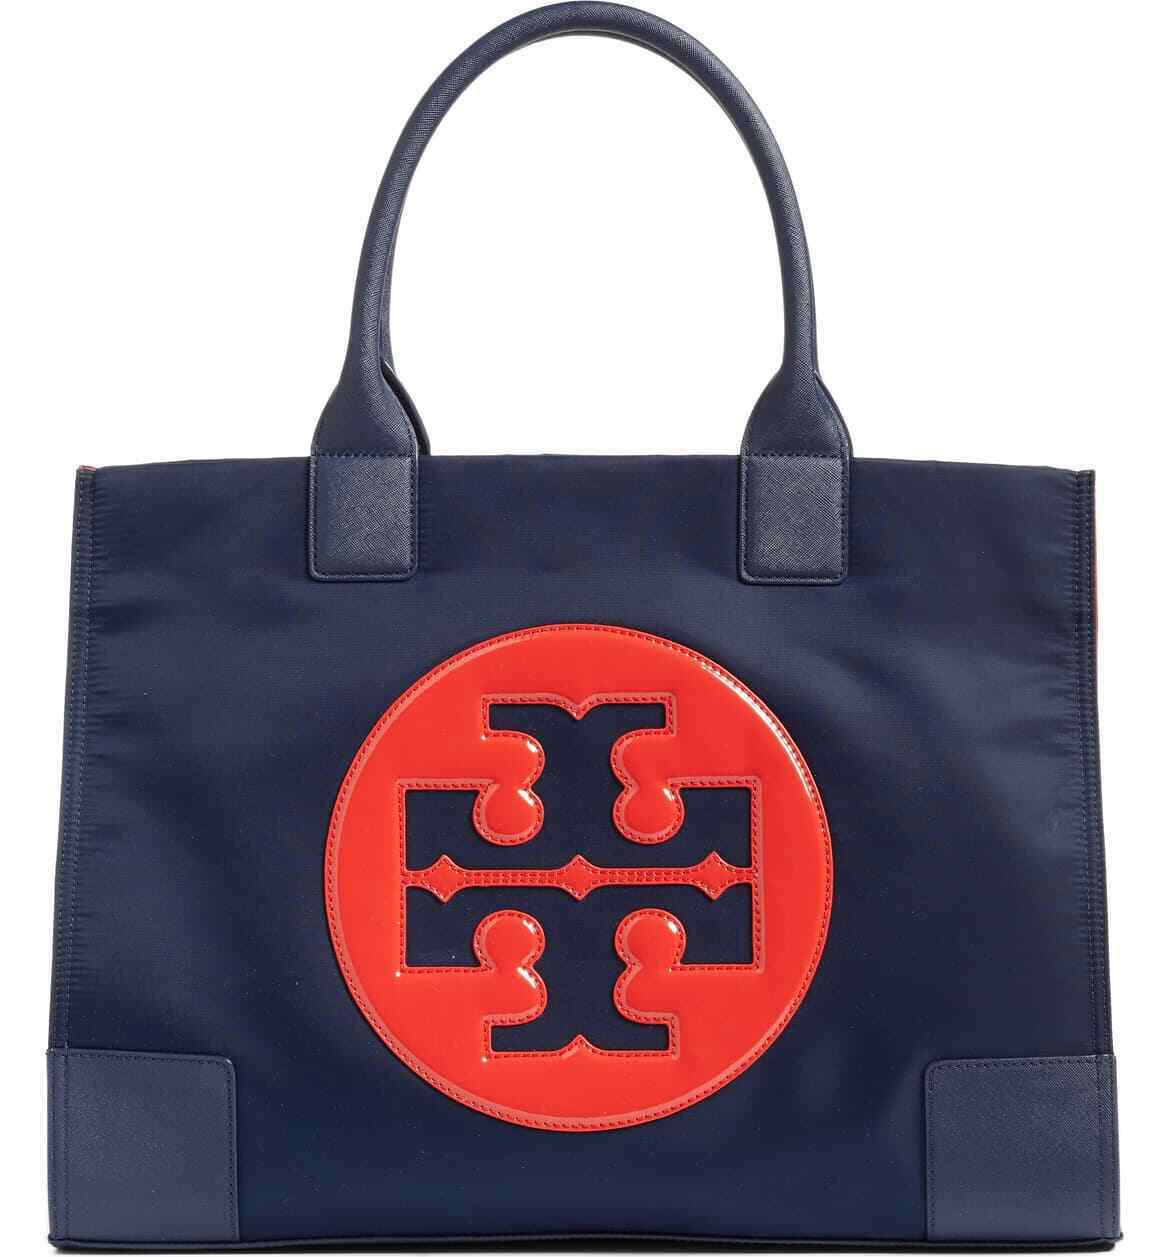 NEW Authentic Tory Burch Ella Nylon Logo Tote Bag Navy Paten